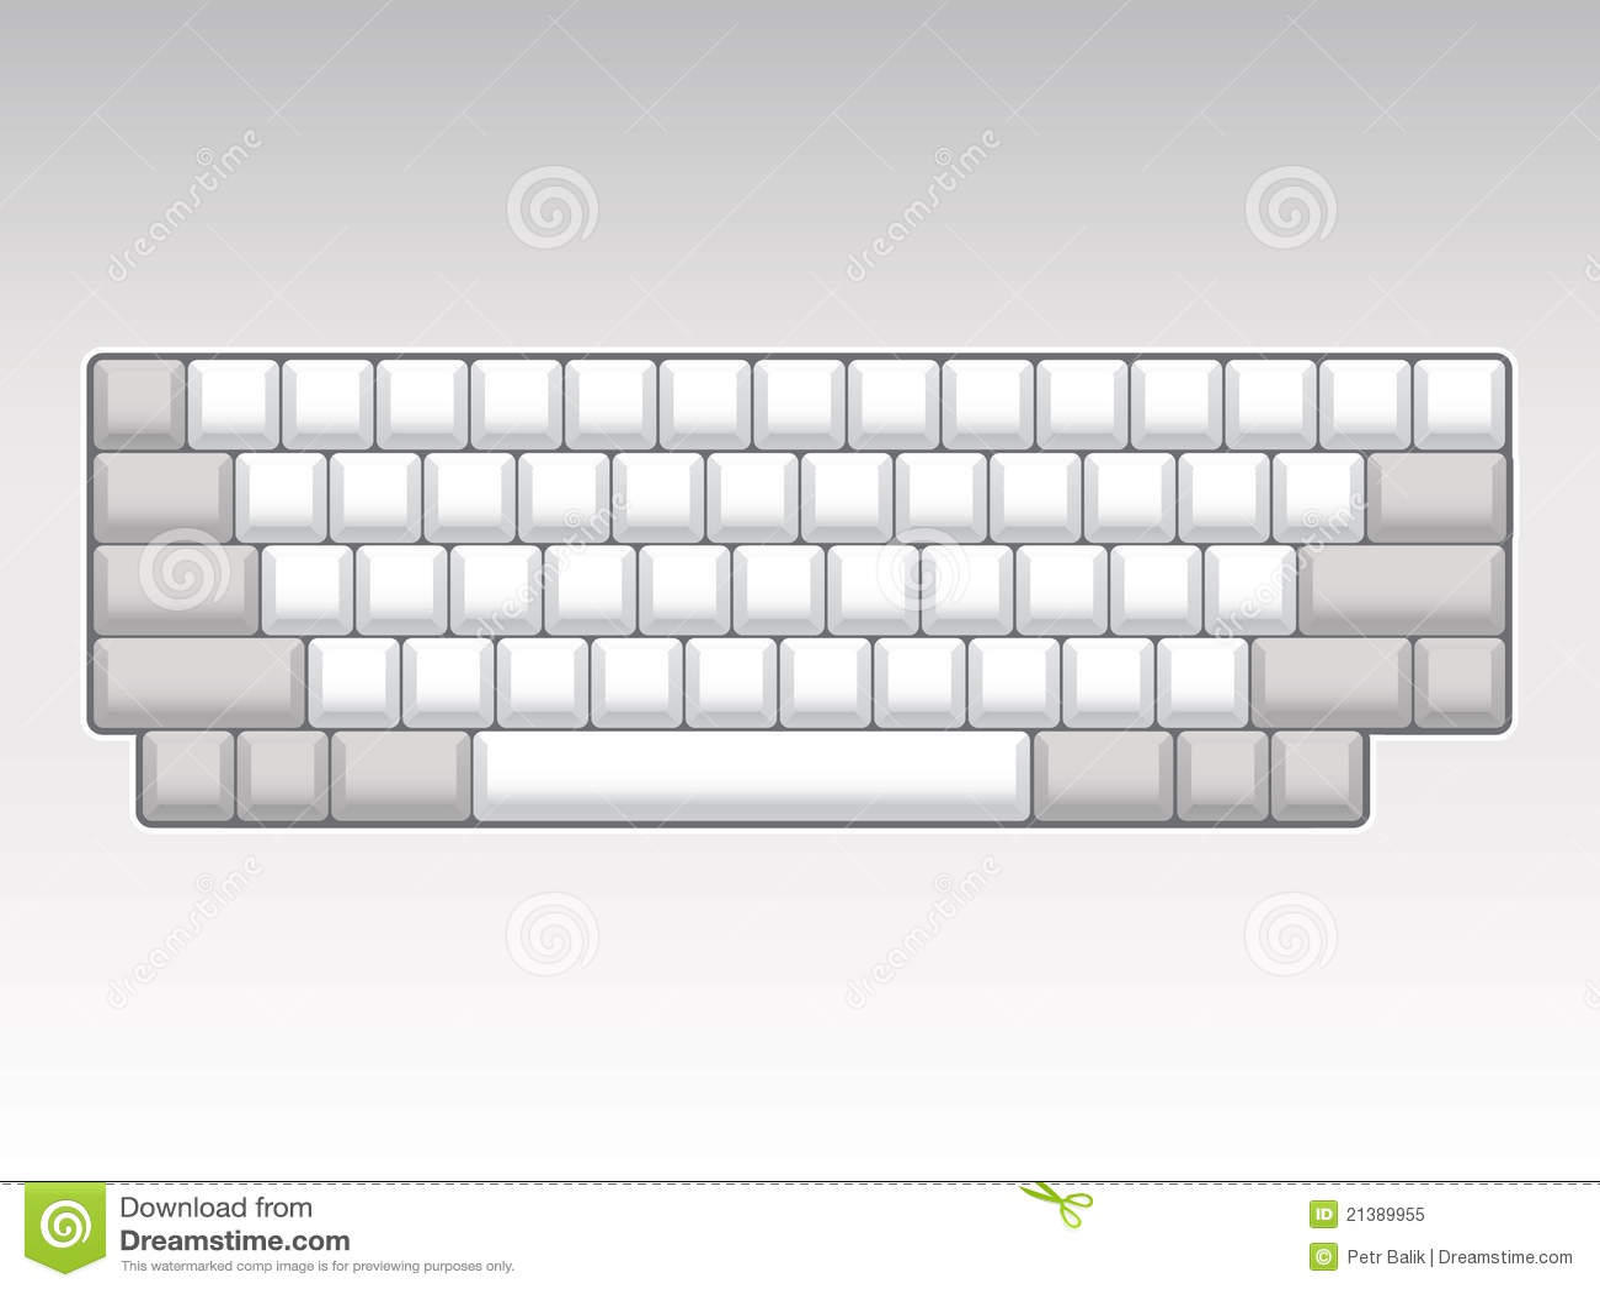 Keyboard Layout Royalty Free Stock Photo